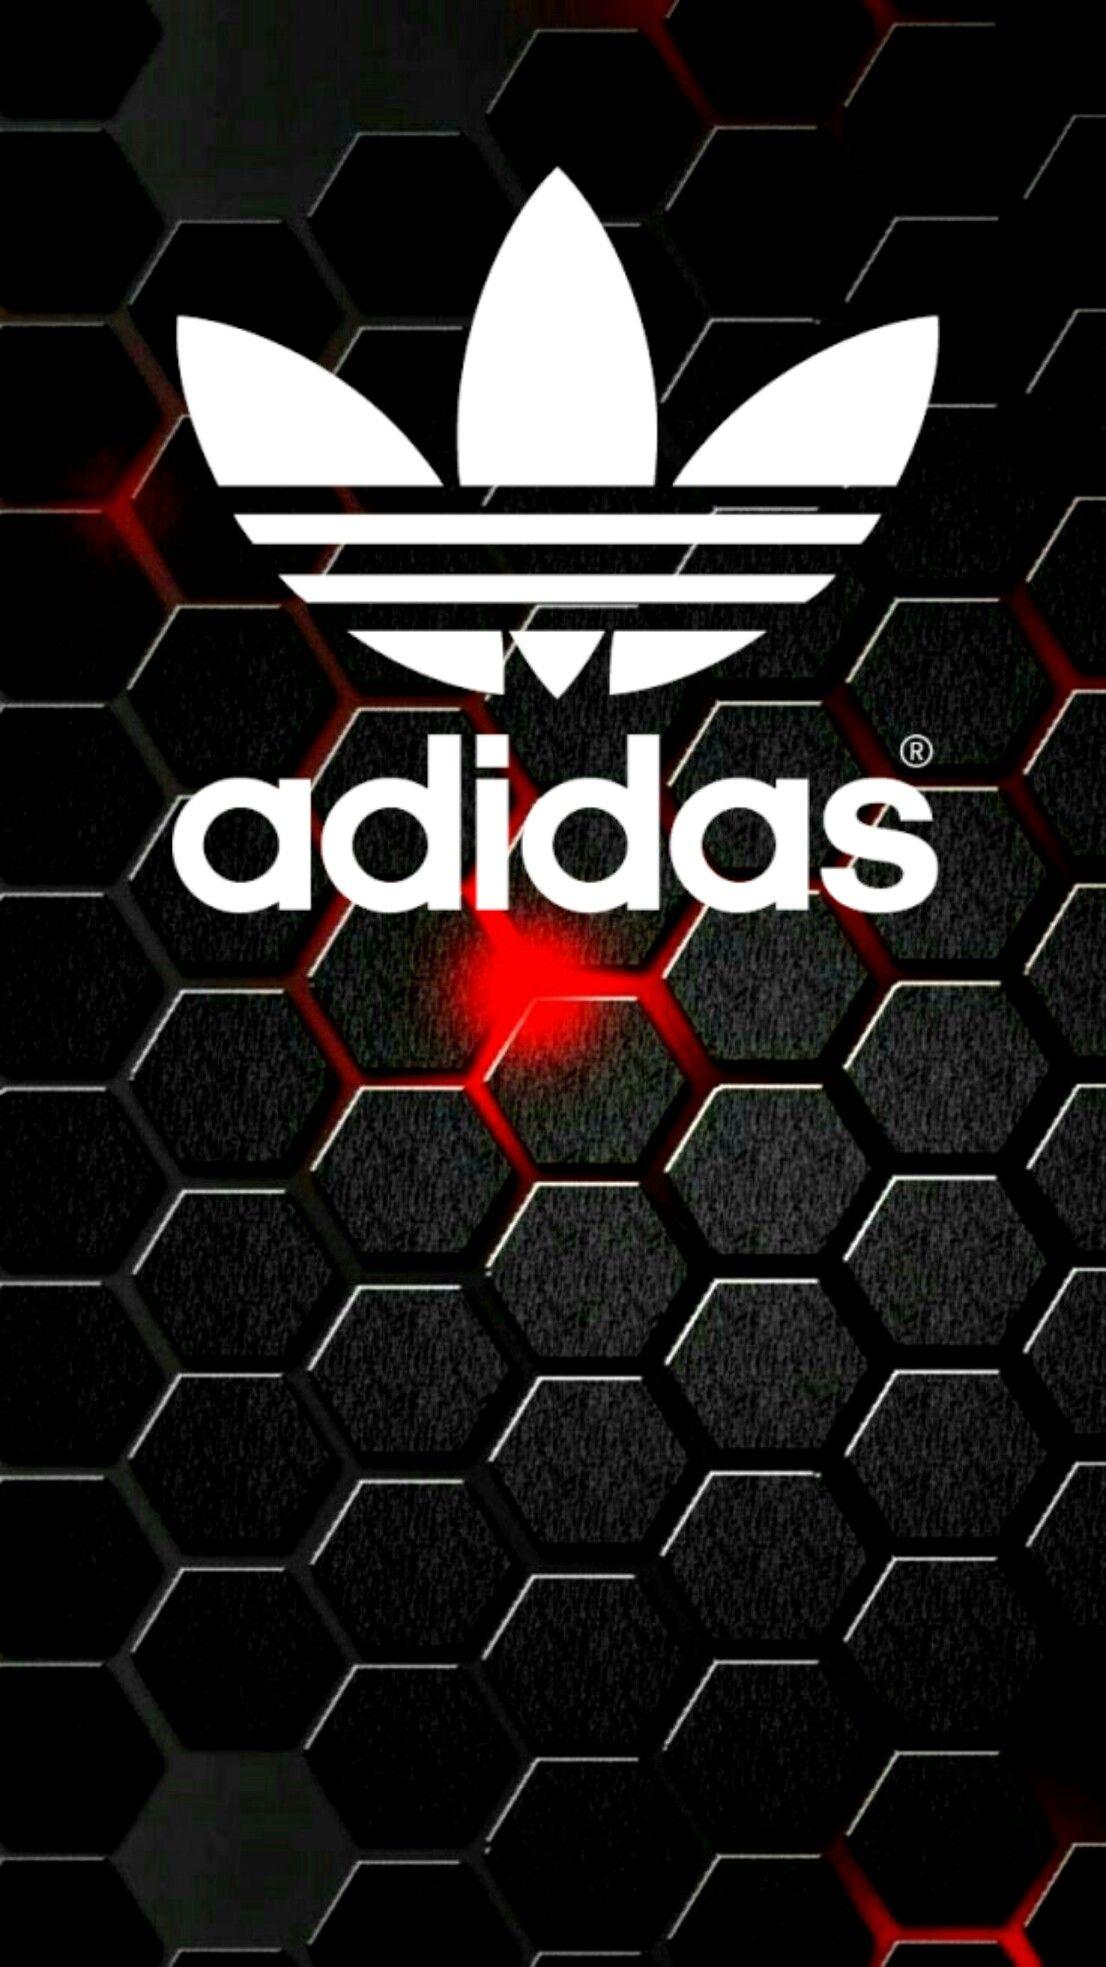 Adidas Black Wallpaper Android Iphone Adidas Wallpapers Adidas Iphone Wallpaper Nike Wallpaper